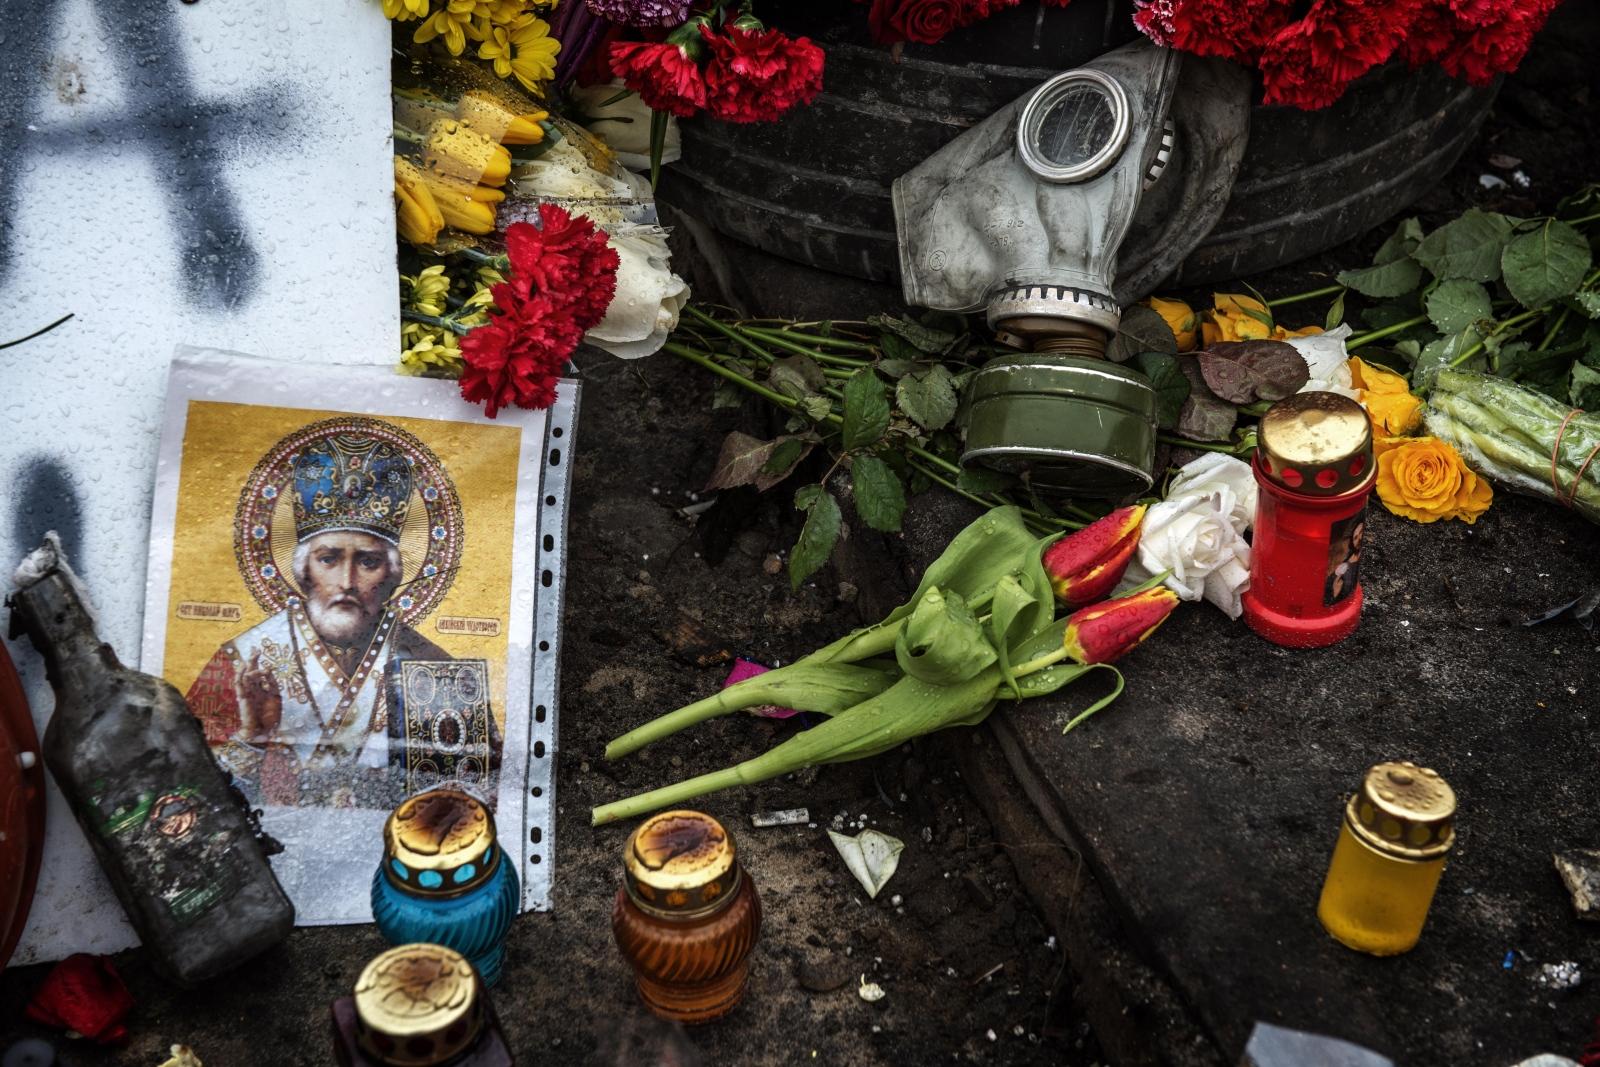 Art and Documentary Photography - Loading Behind_Kiev_s_barricades_41.jpg